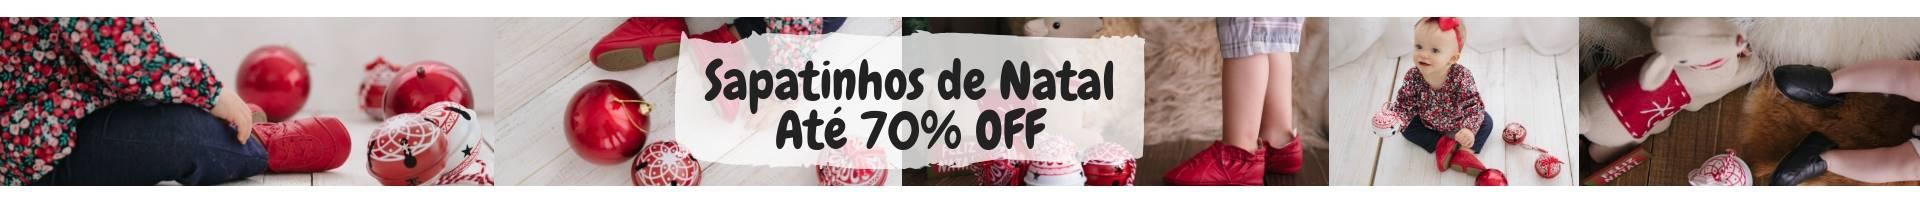 Sapatinhos de NatalAté 70% OFF m,in